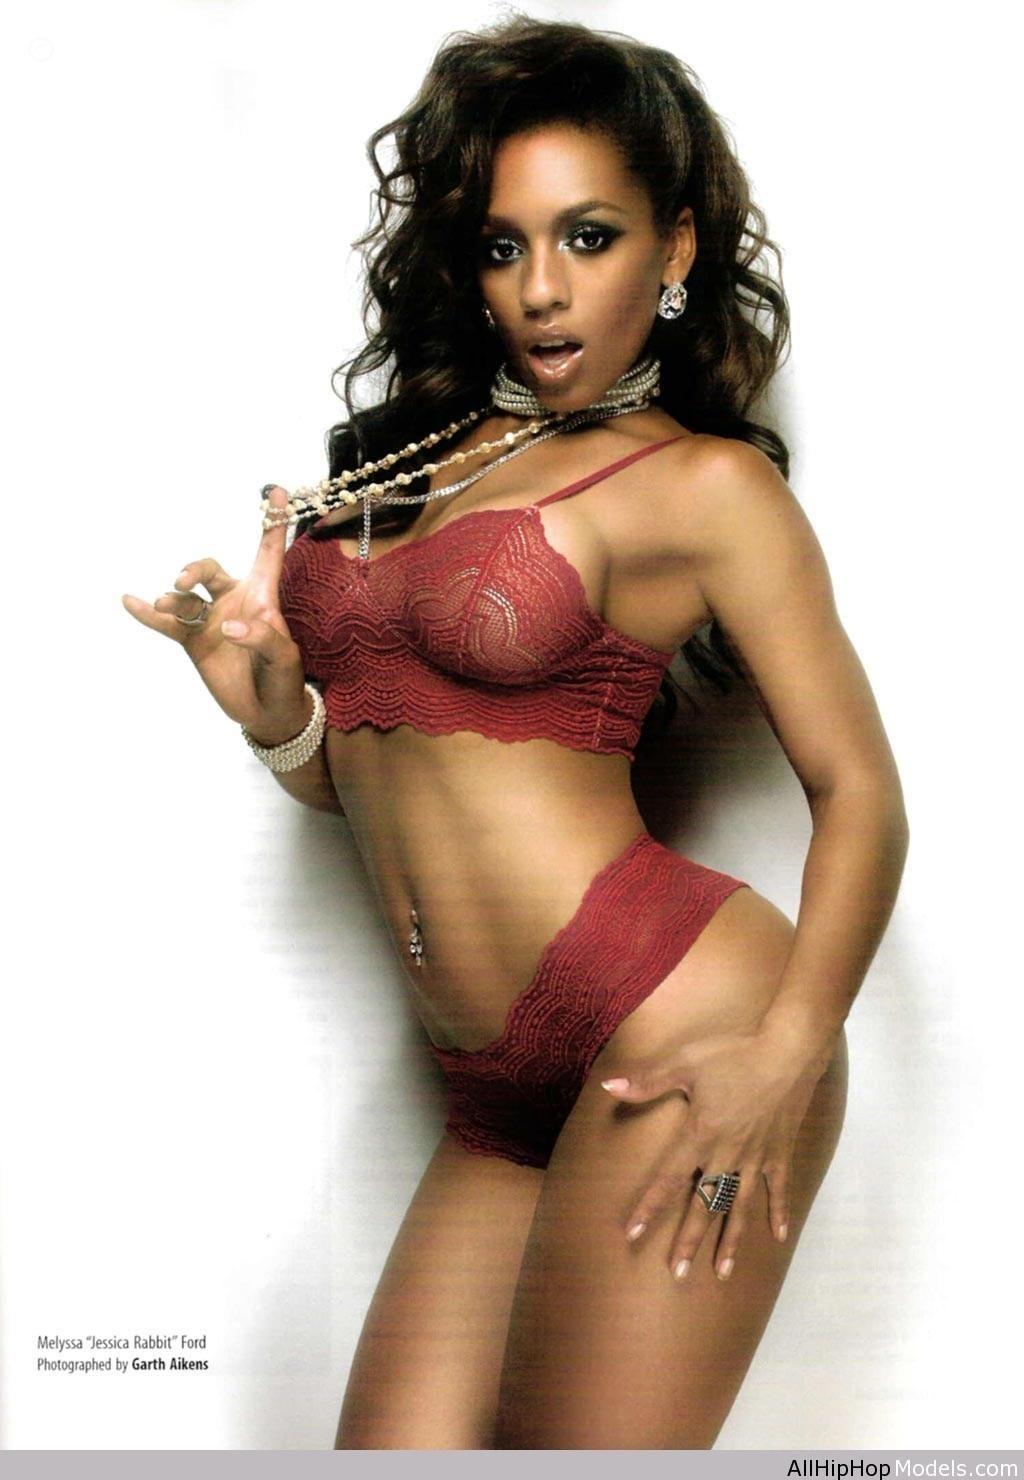 Hip Hop Models Nude Girls-Adult Gallery-5889